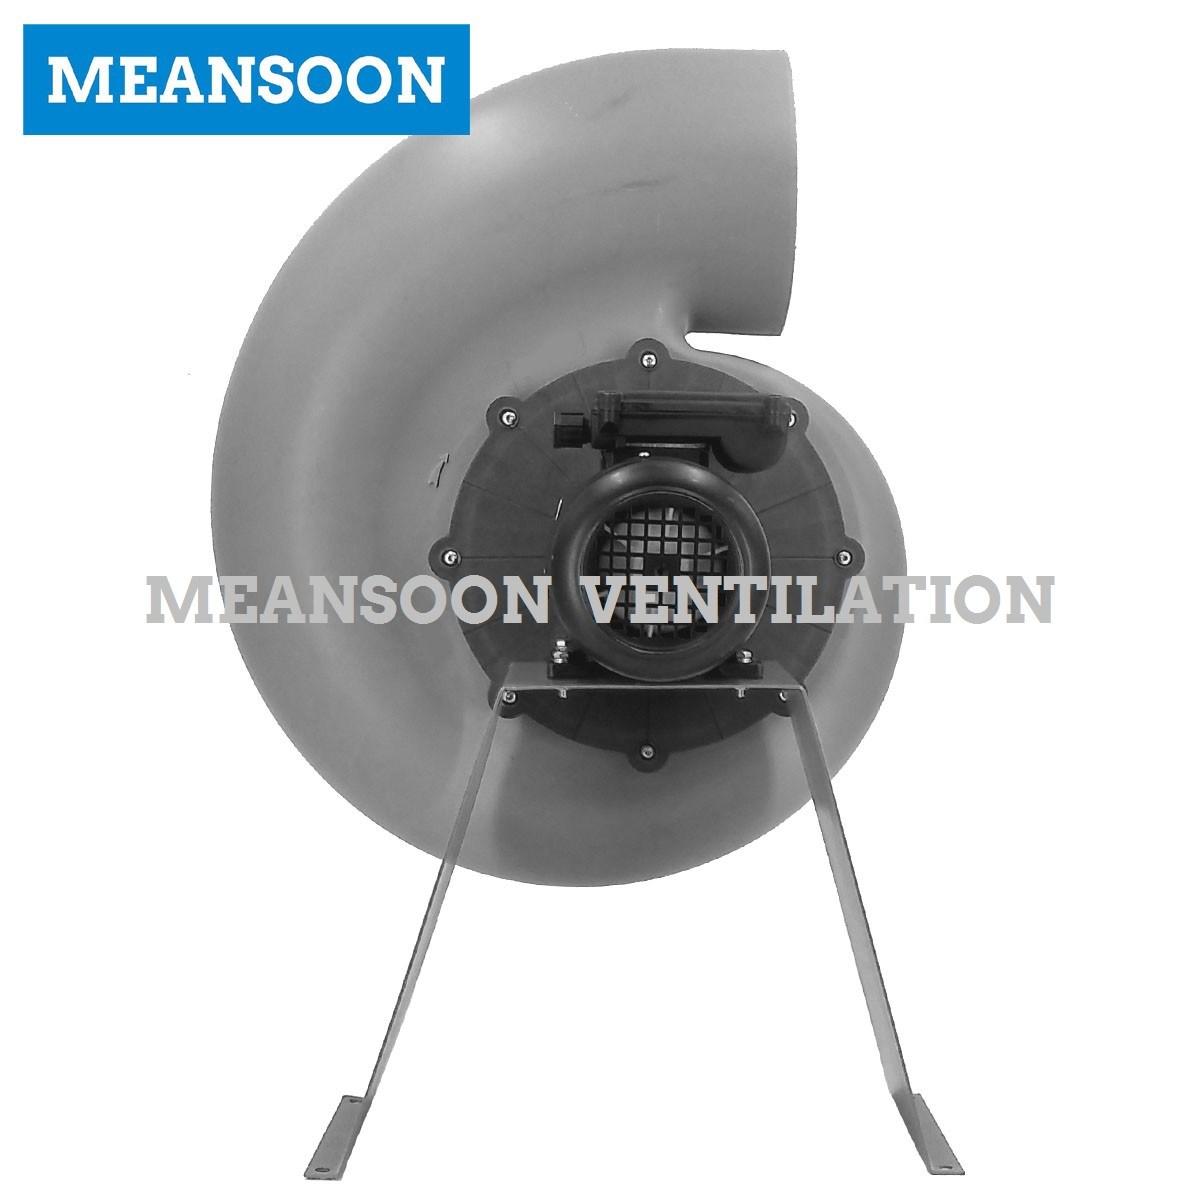 Plastic Corrosion Proof Radial Fan for Laboratory Ventilation